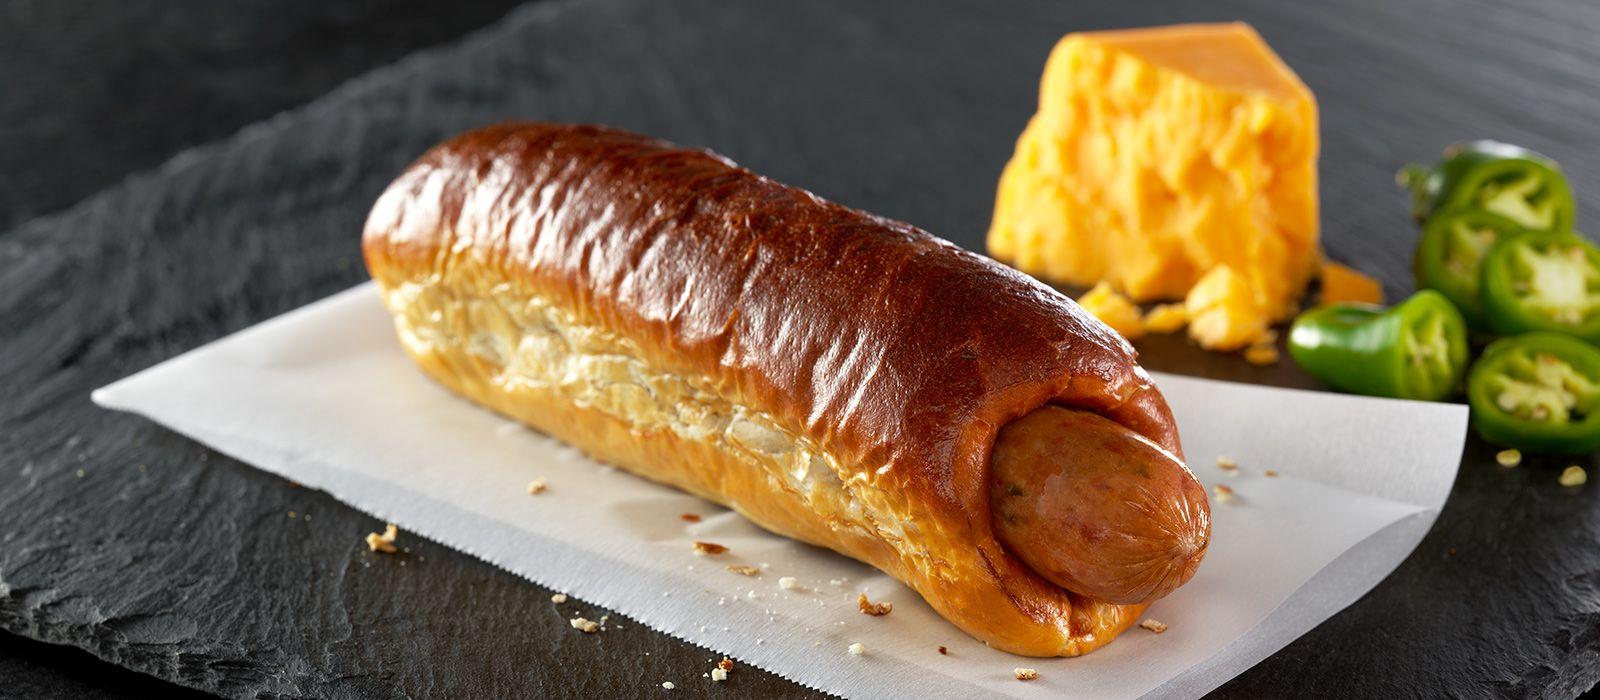 bahama mama jalapeno n cheddar twisted pretzel dog